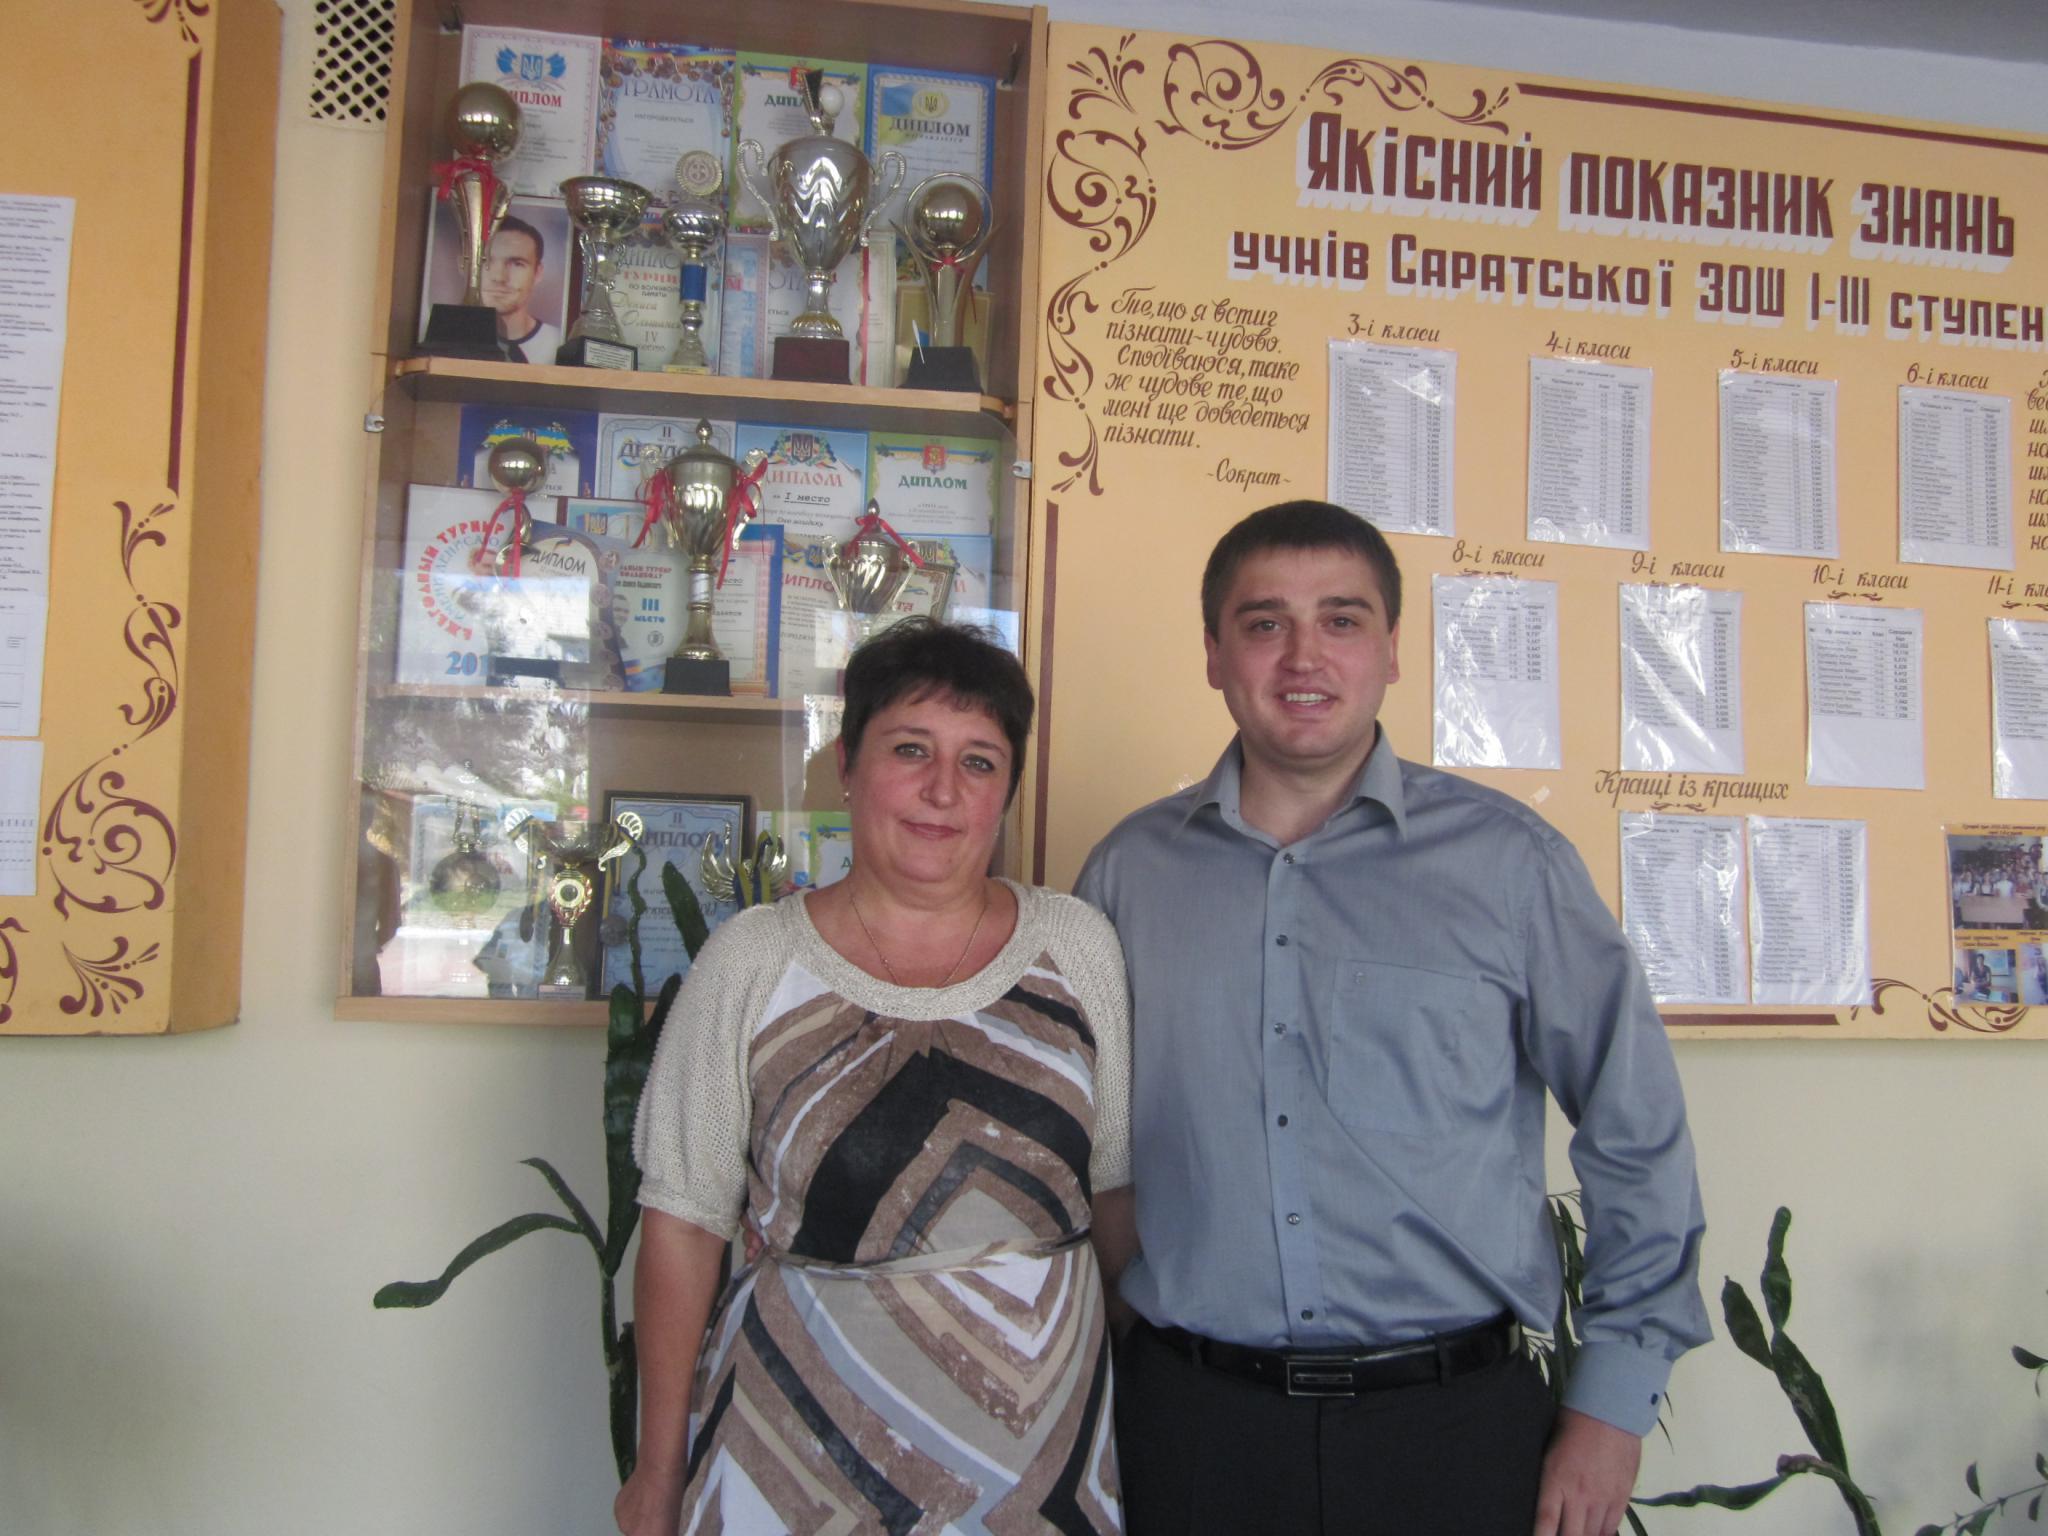 Сарата. Александр Борняков о развитии системы образования.